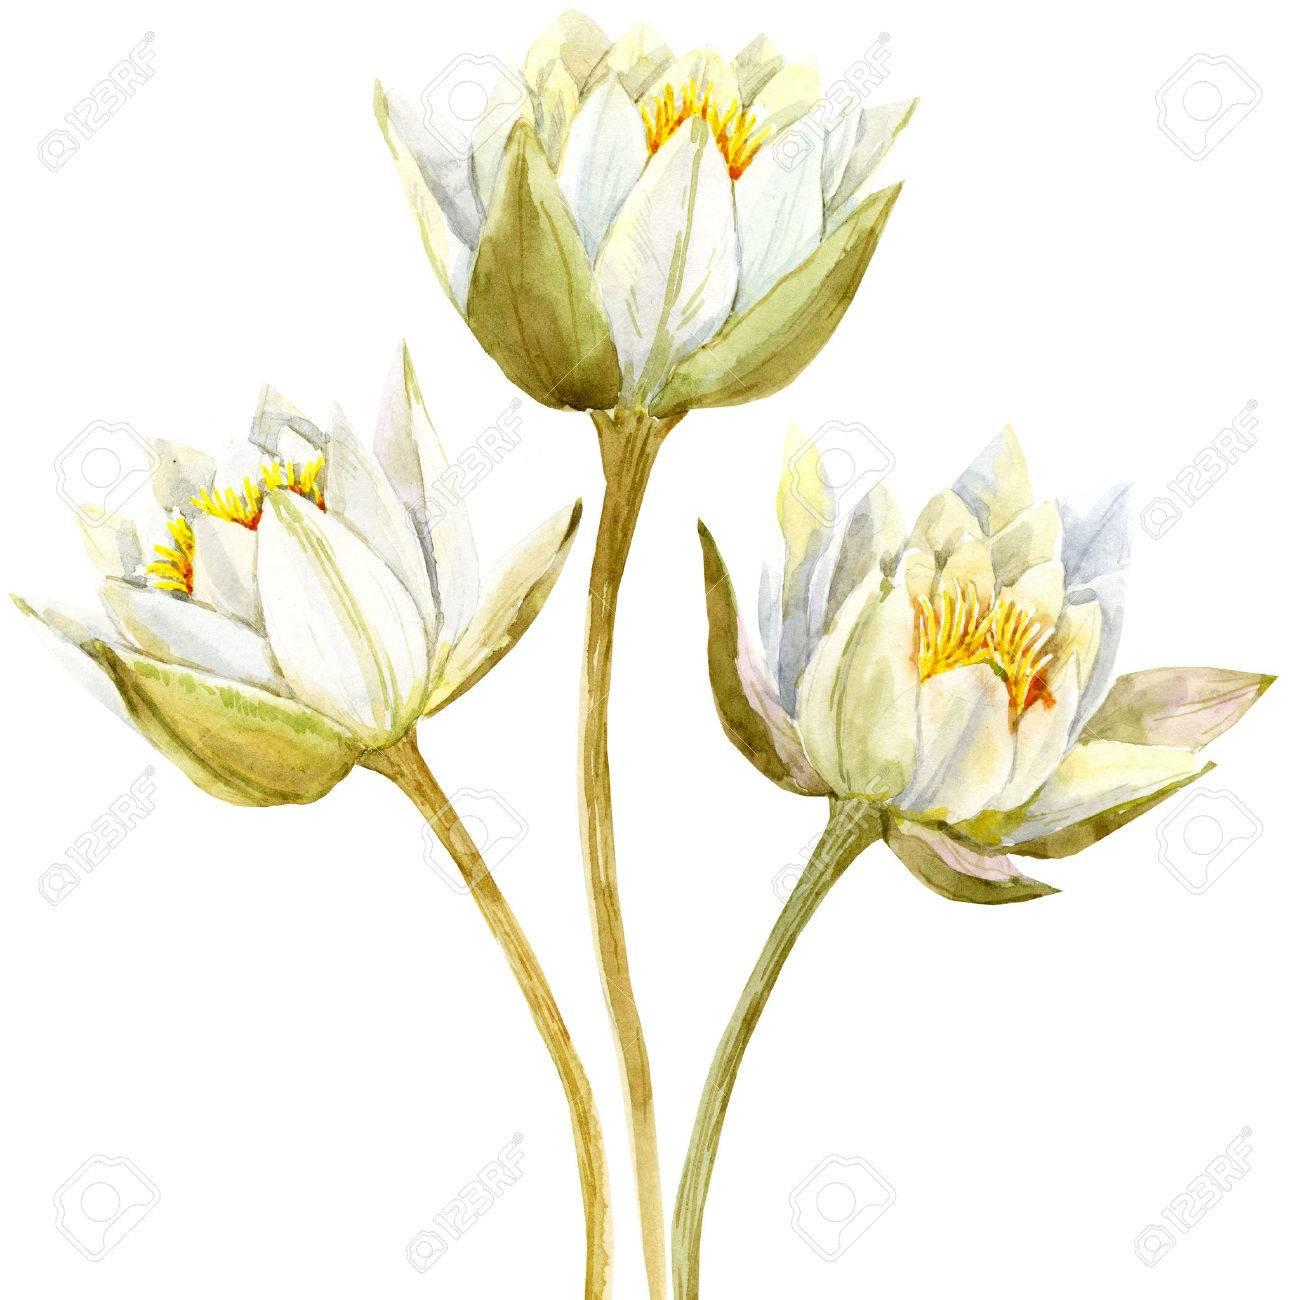 Beautiful Image With Nice Watercolor Lotus Flowers Stock Photo